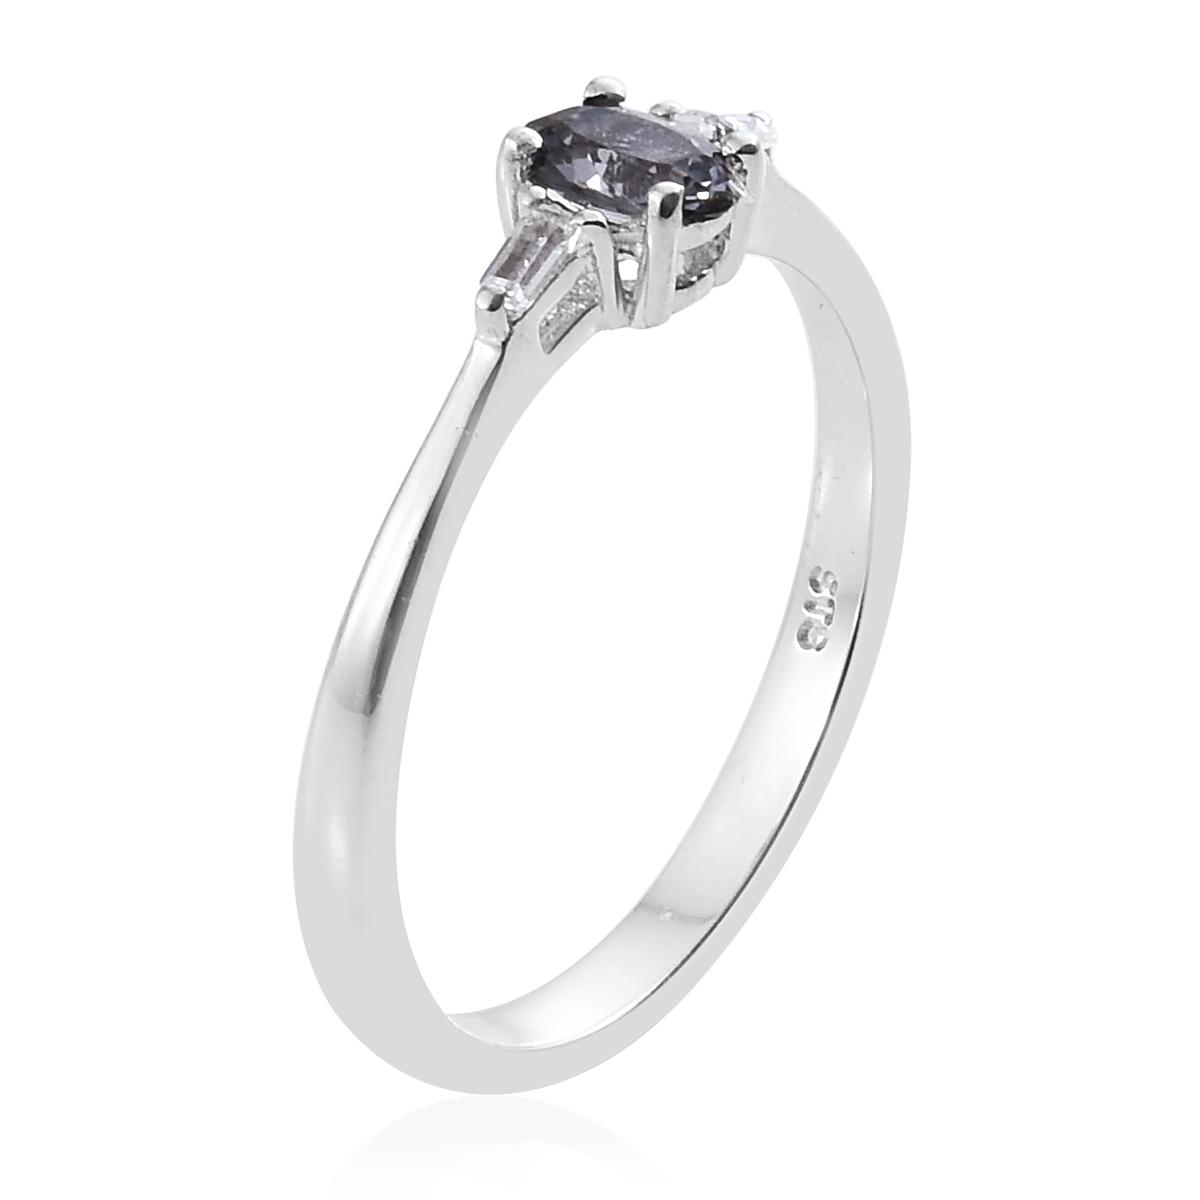 platinum spinel white topaz platinum over sterling silver ring size 7 0 tgw cts. Black Bedroom Furniture Sets. Home Design Ideas